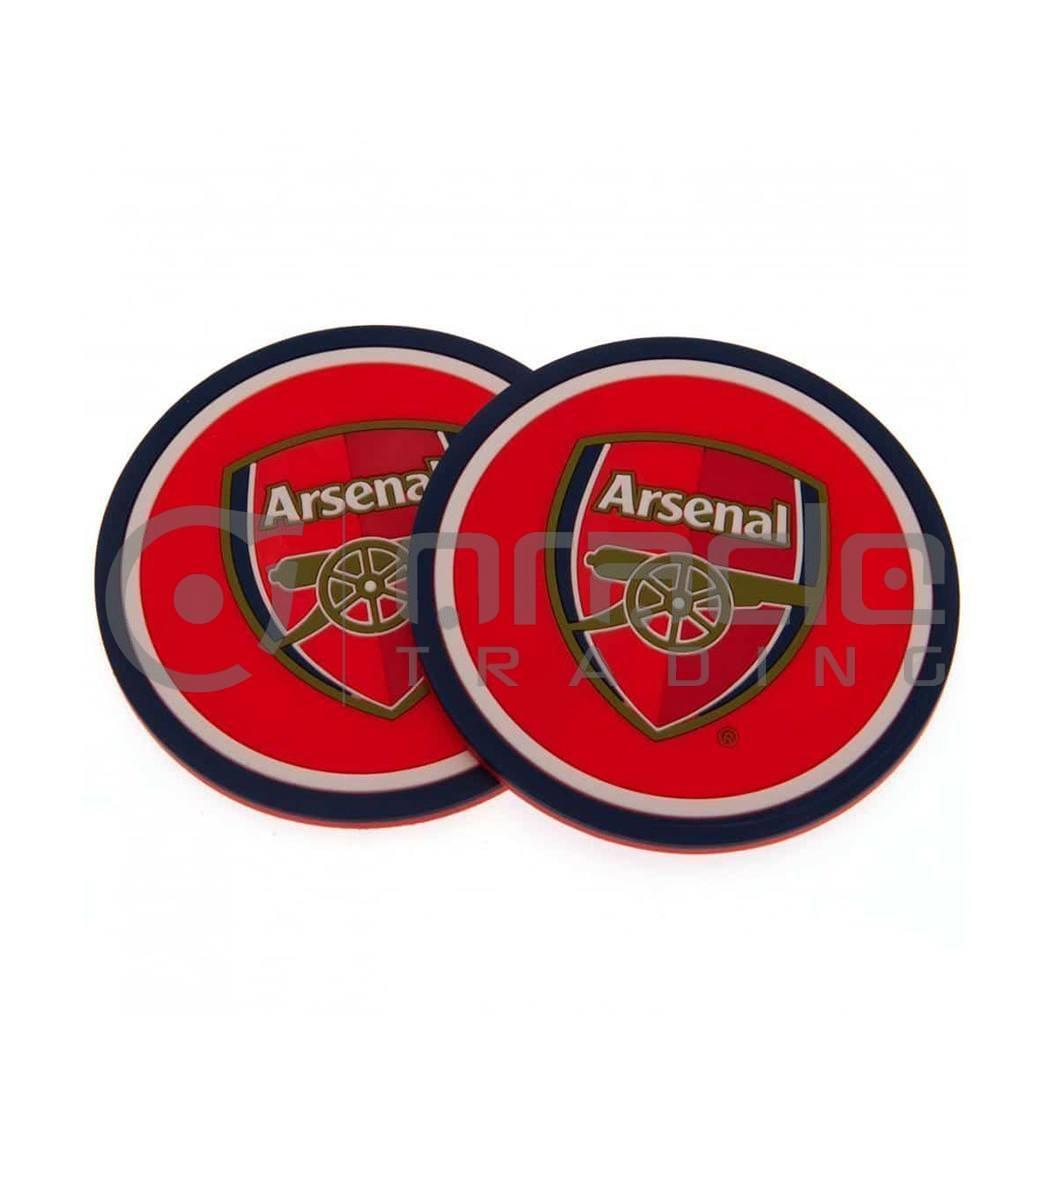 Arsenal Coaster Set